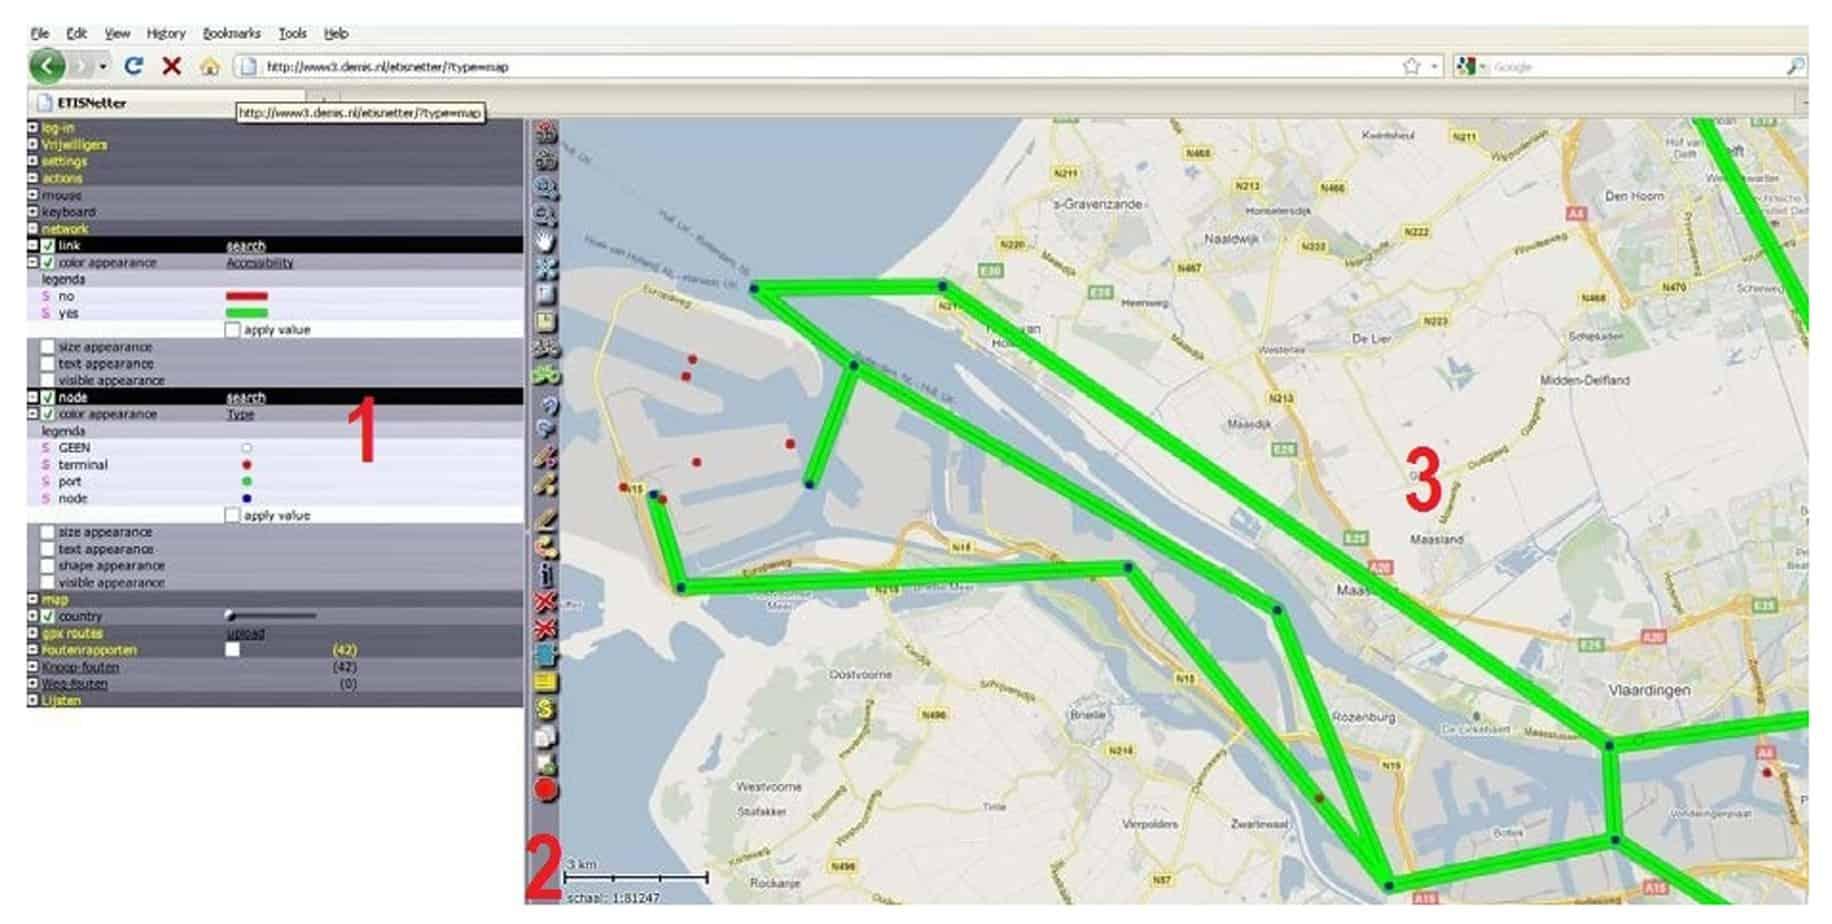 Il browser web di ETI - netter (1. applicazioni di settings; 2. toolbar verticale; 3. mappa Client)